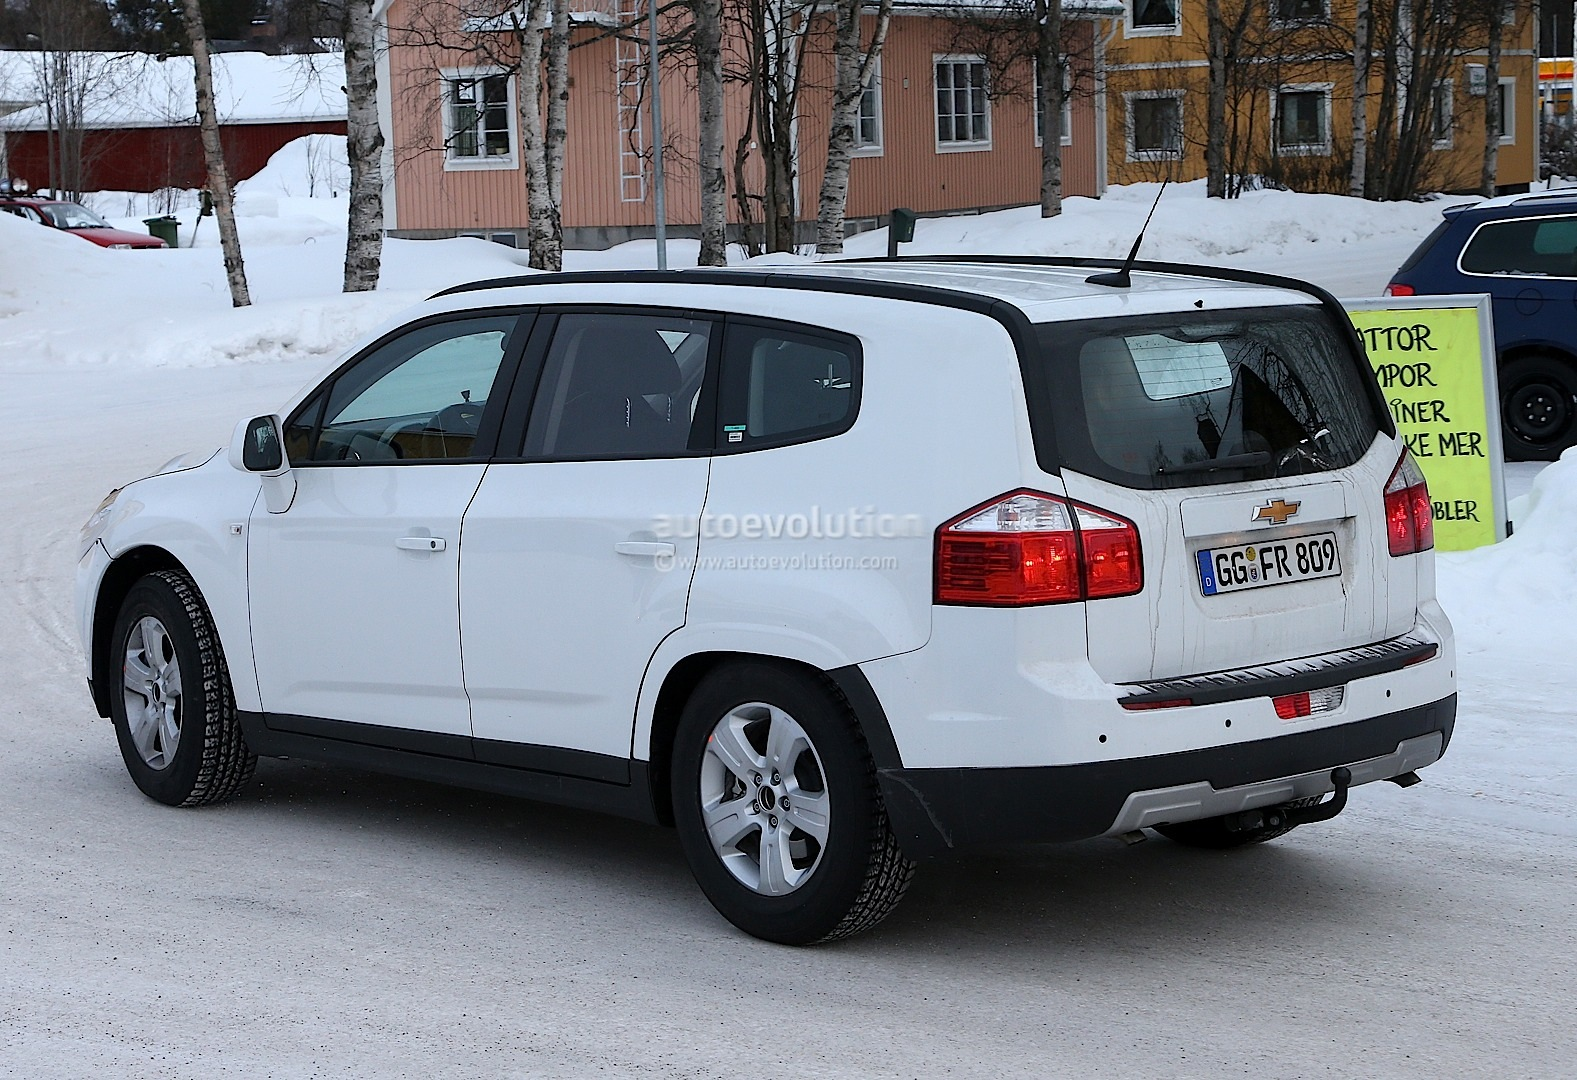 Spyshots Opel Antara Chevrolet Captiva Suv Test Mules Autoevolution